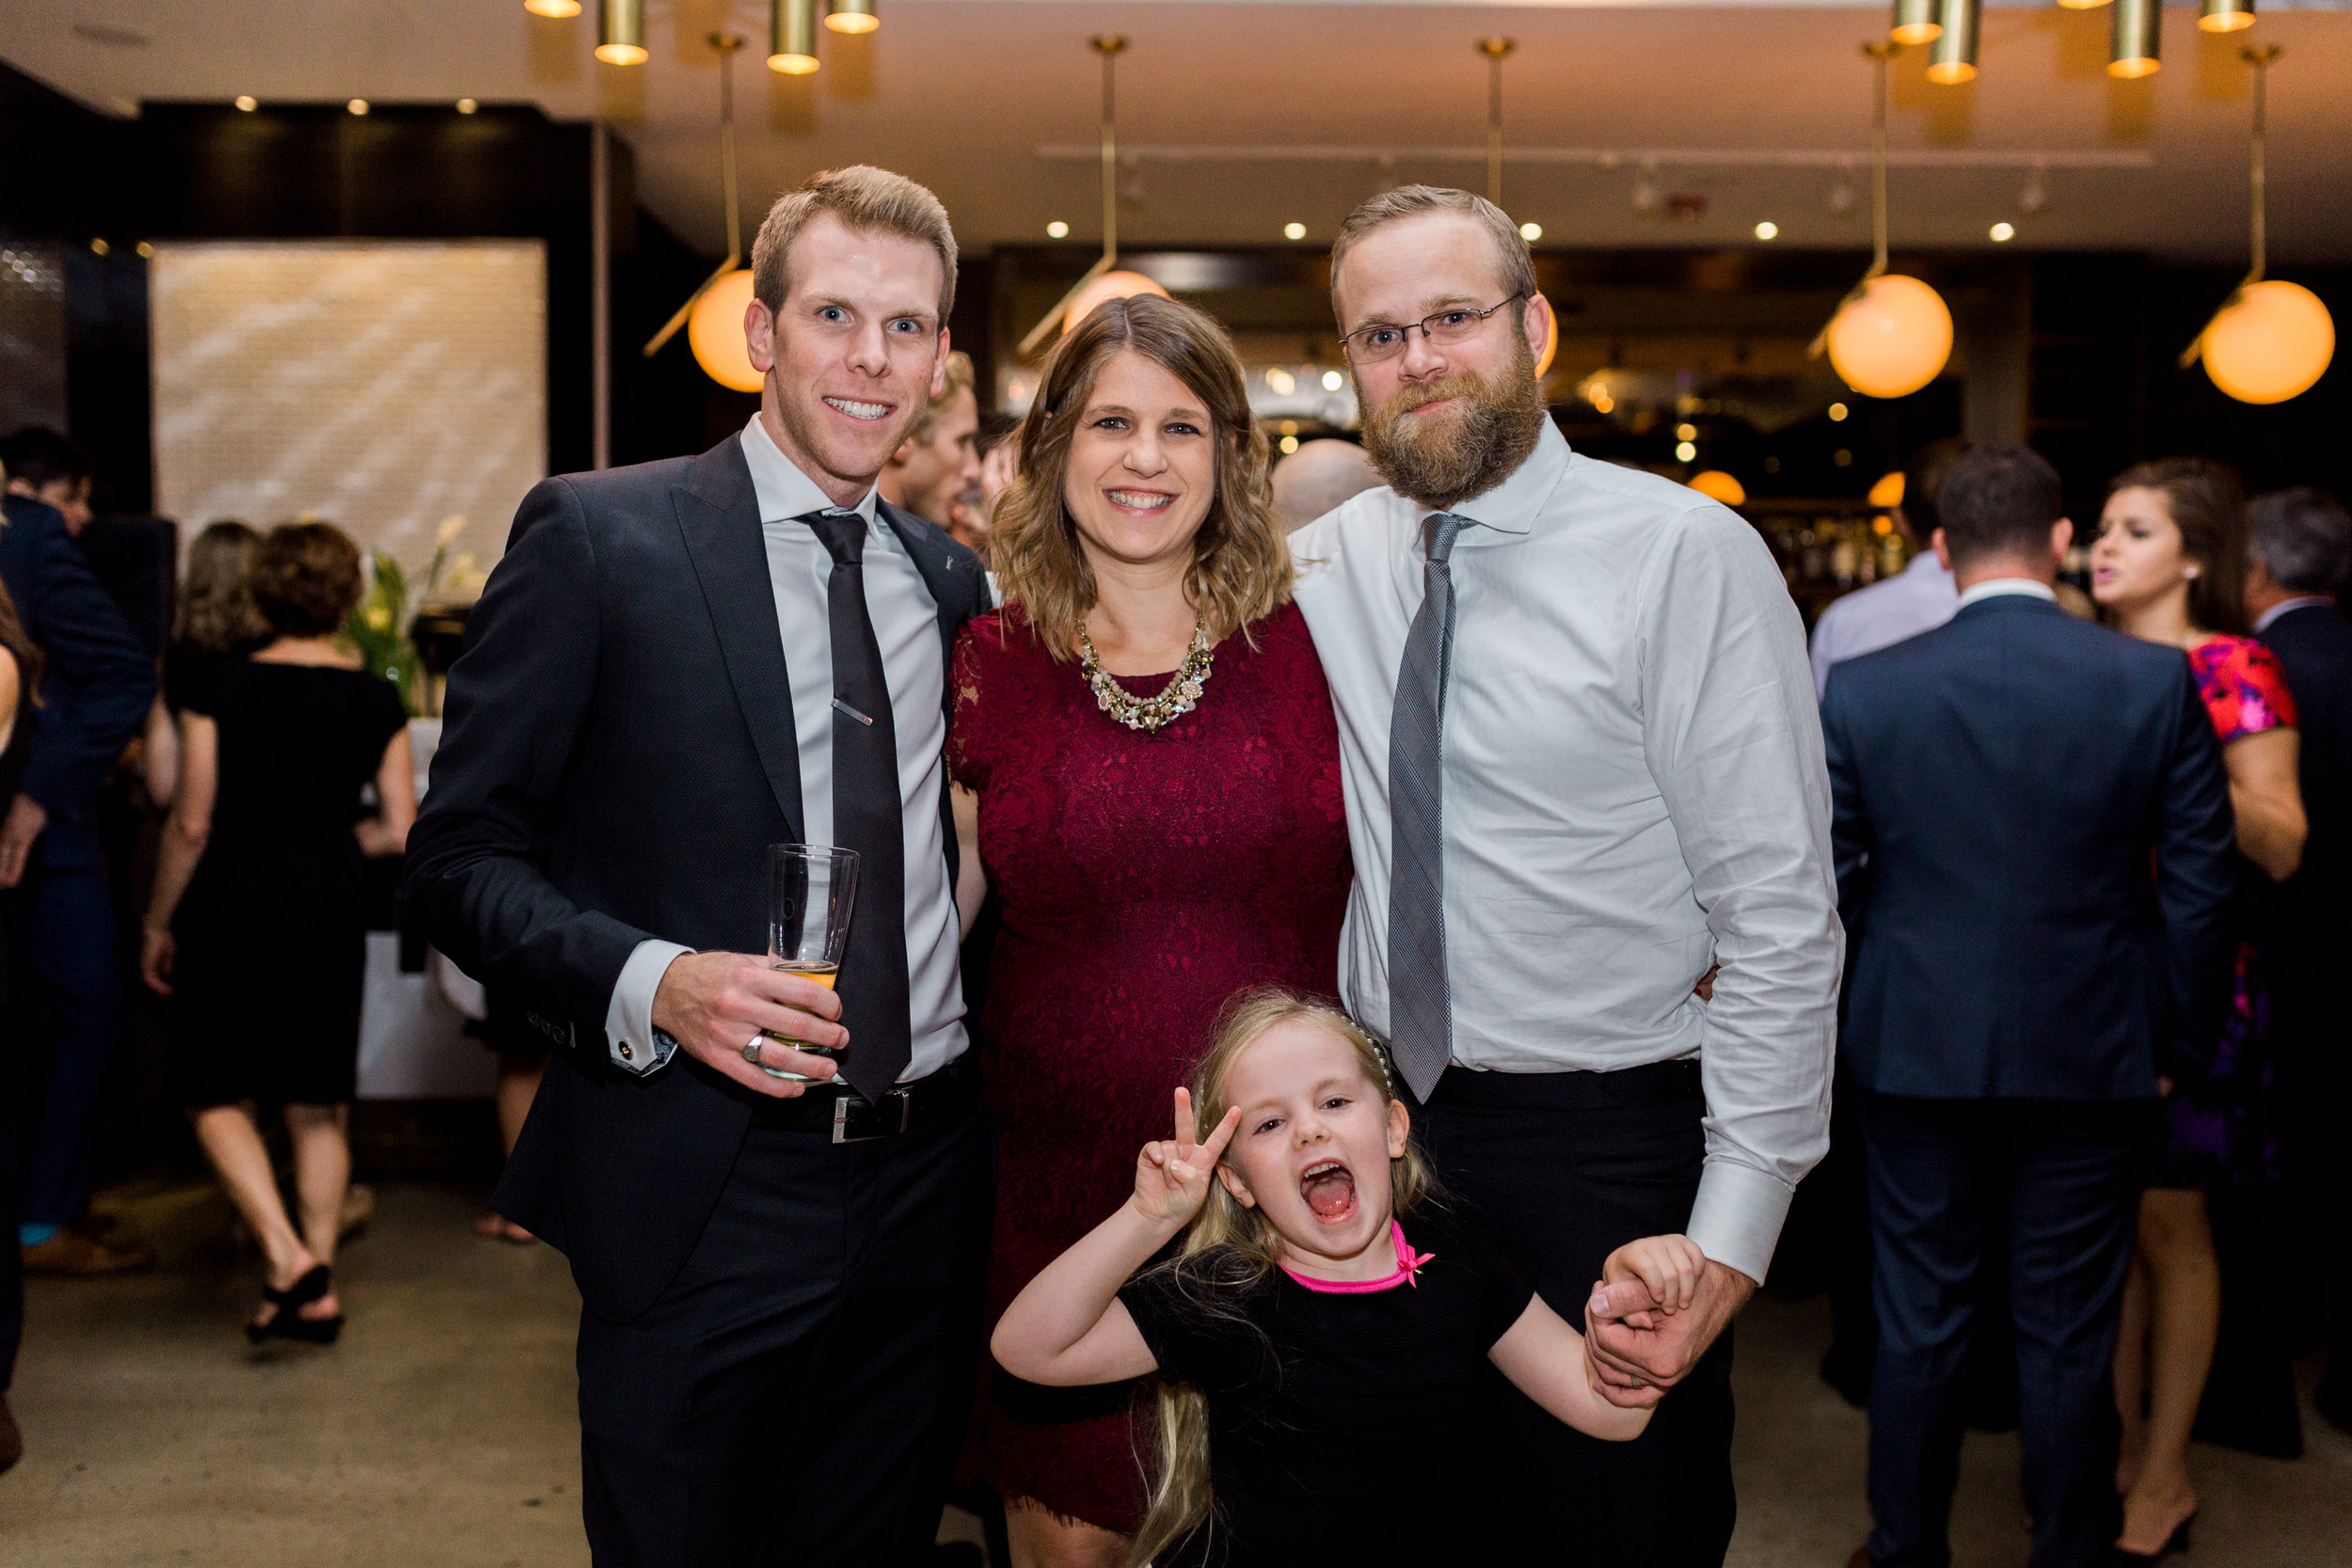 Toronto Fine Art Photographer - 180 Restaurant Wedding - Ceremony-82.jpg